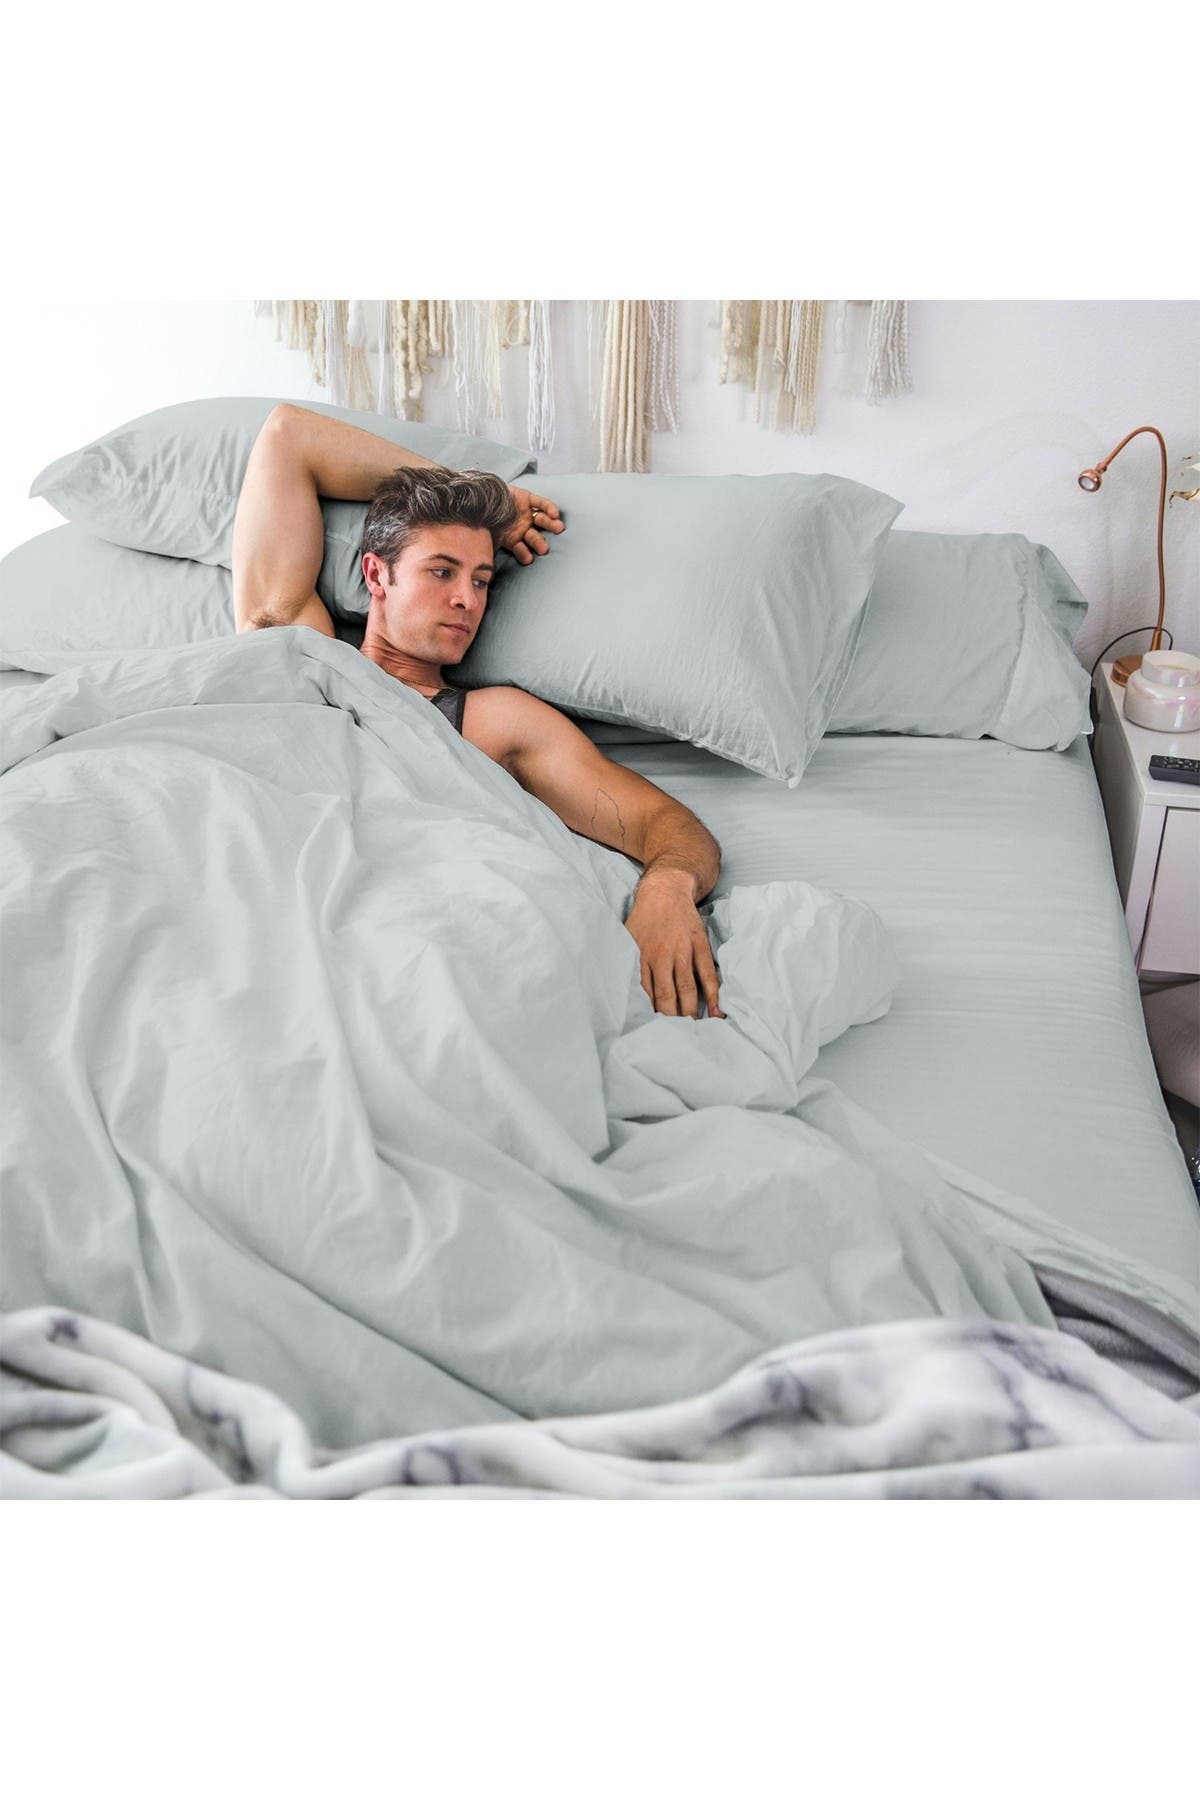 Image of Pillow Guy Classic Cool & Crisp Cotton Percale 4-Piece Sheet Set - Light Grey - Queen Size